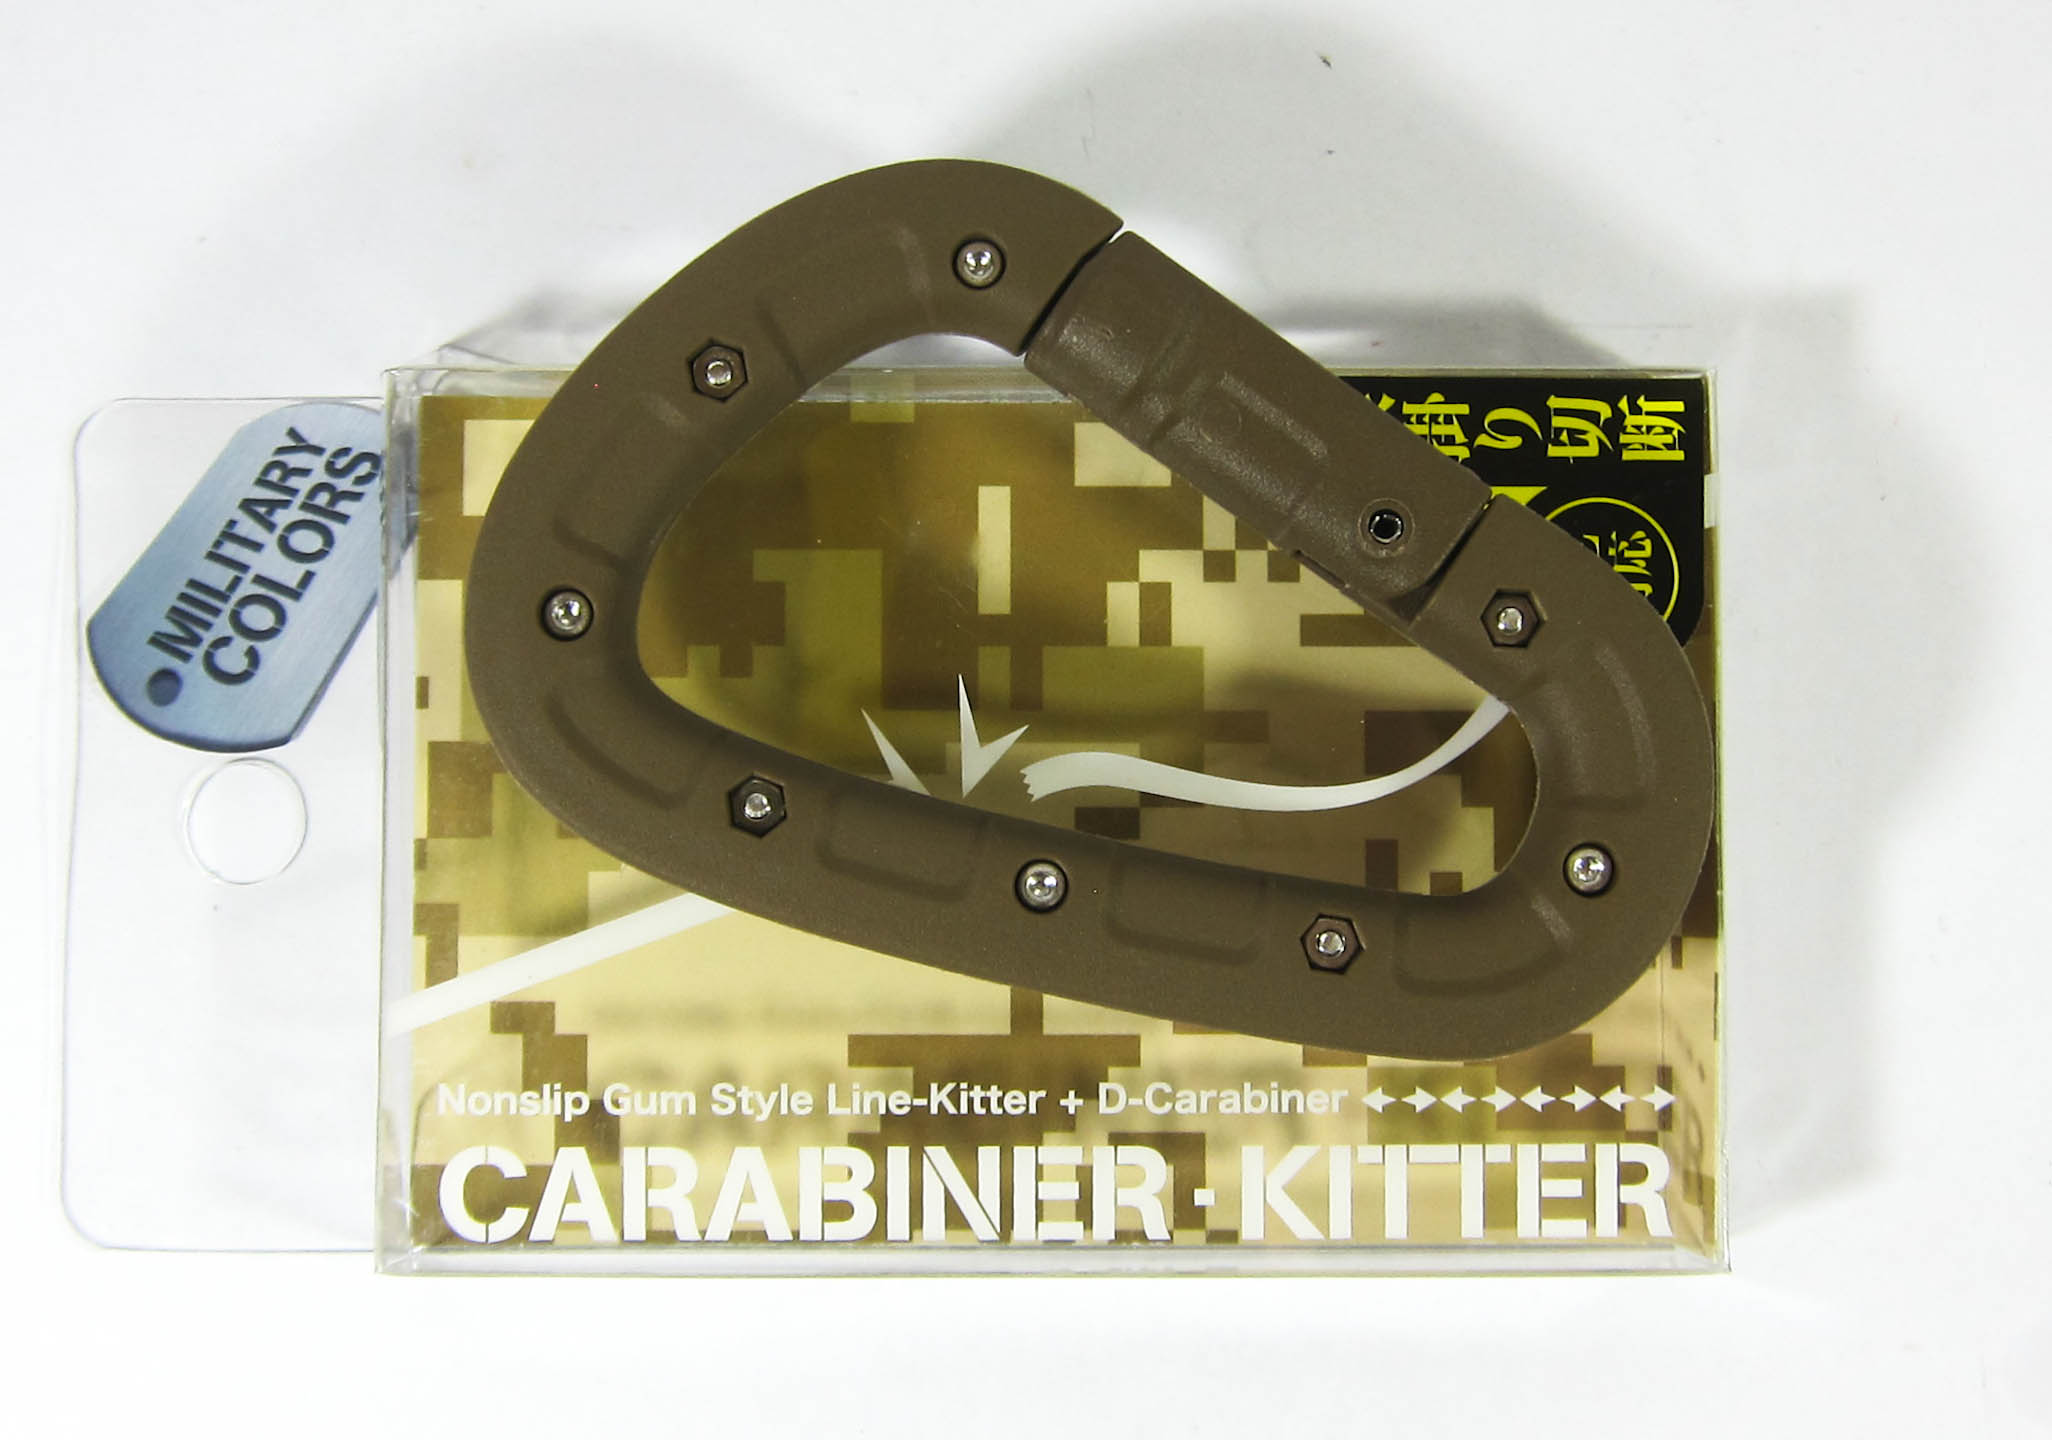 Daiichi #33212 D Carabiner Line Kitter Line Tightener Green (2123)